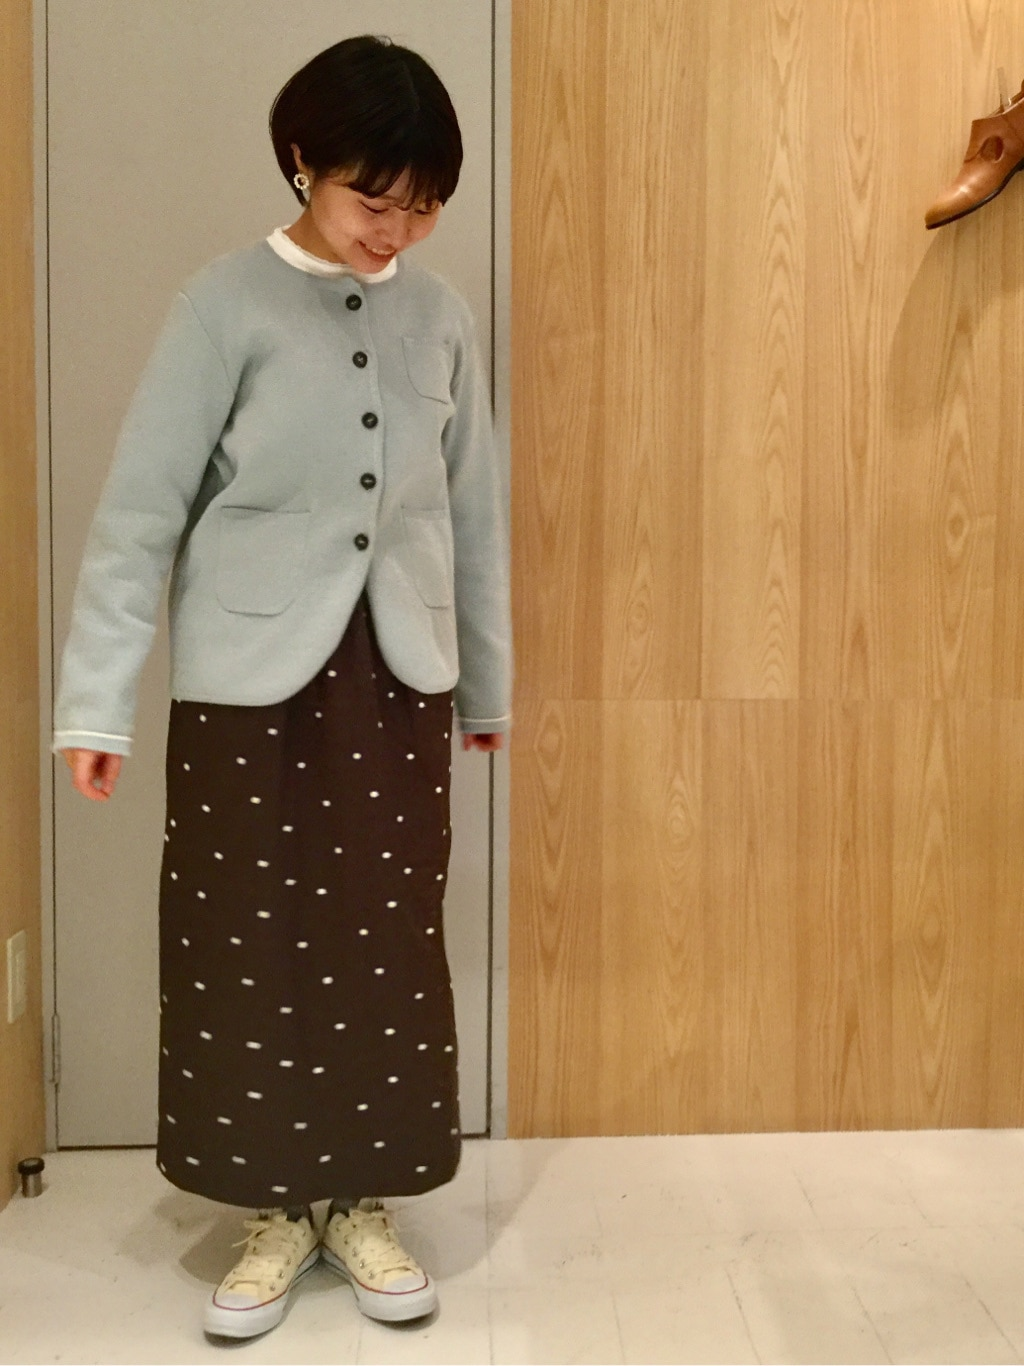 bulle de savon なんばシティ 身長:149cm 2020.02.01